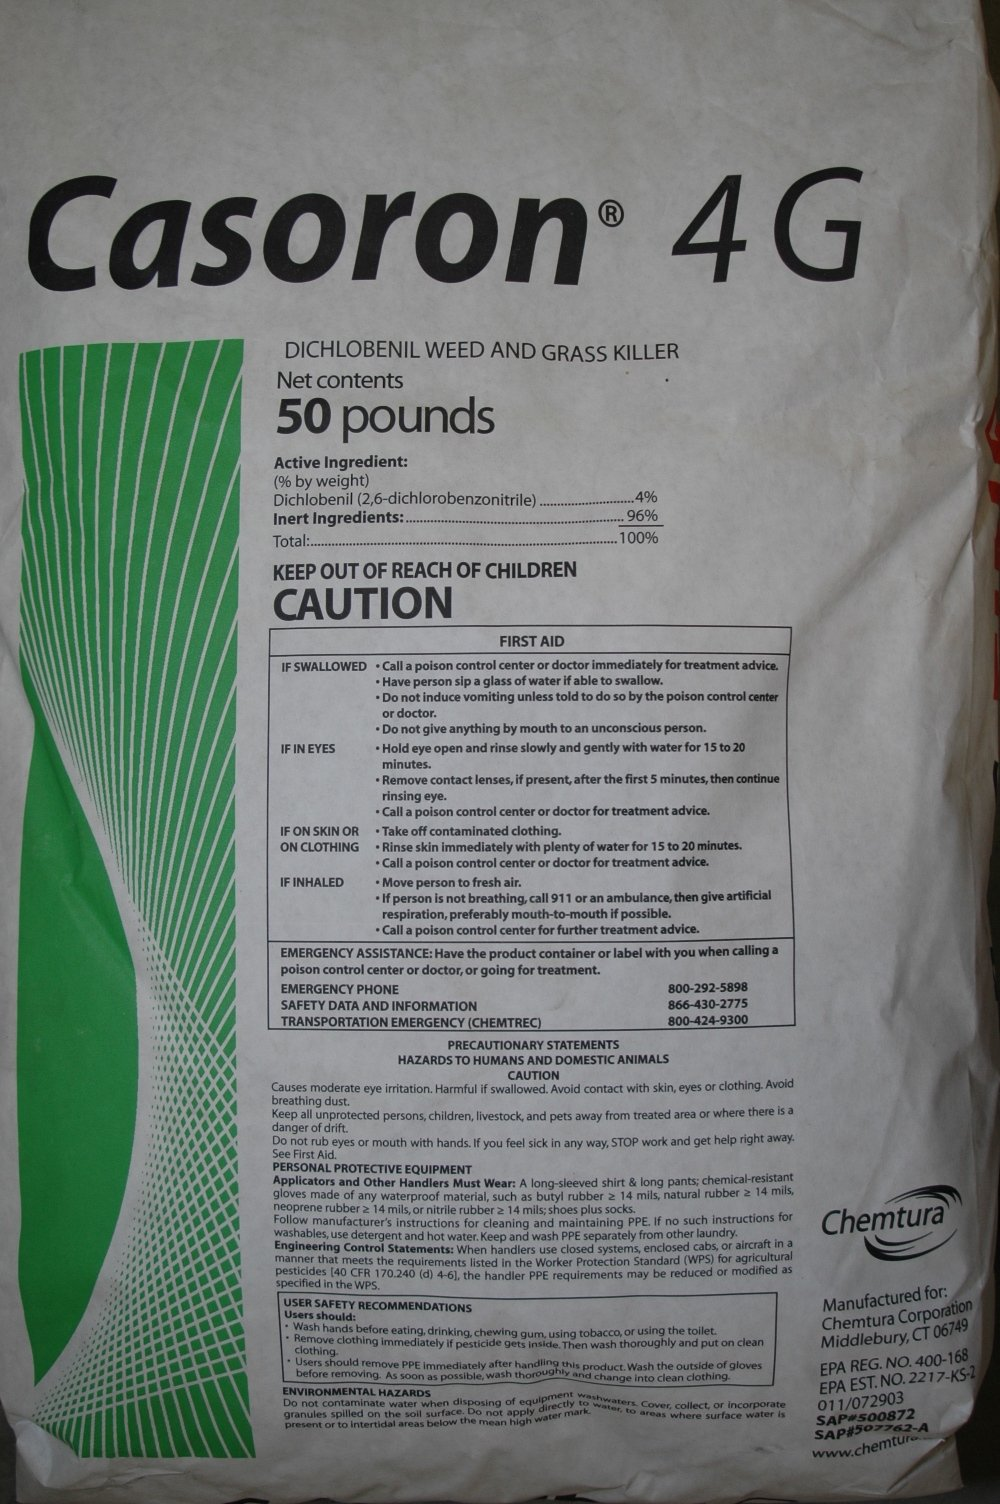 Casoron 4G (50 Pound bag) Mulch Bed Weed Inhibitor